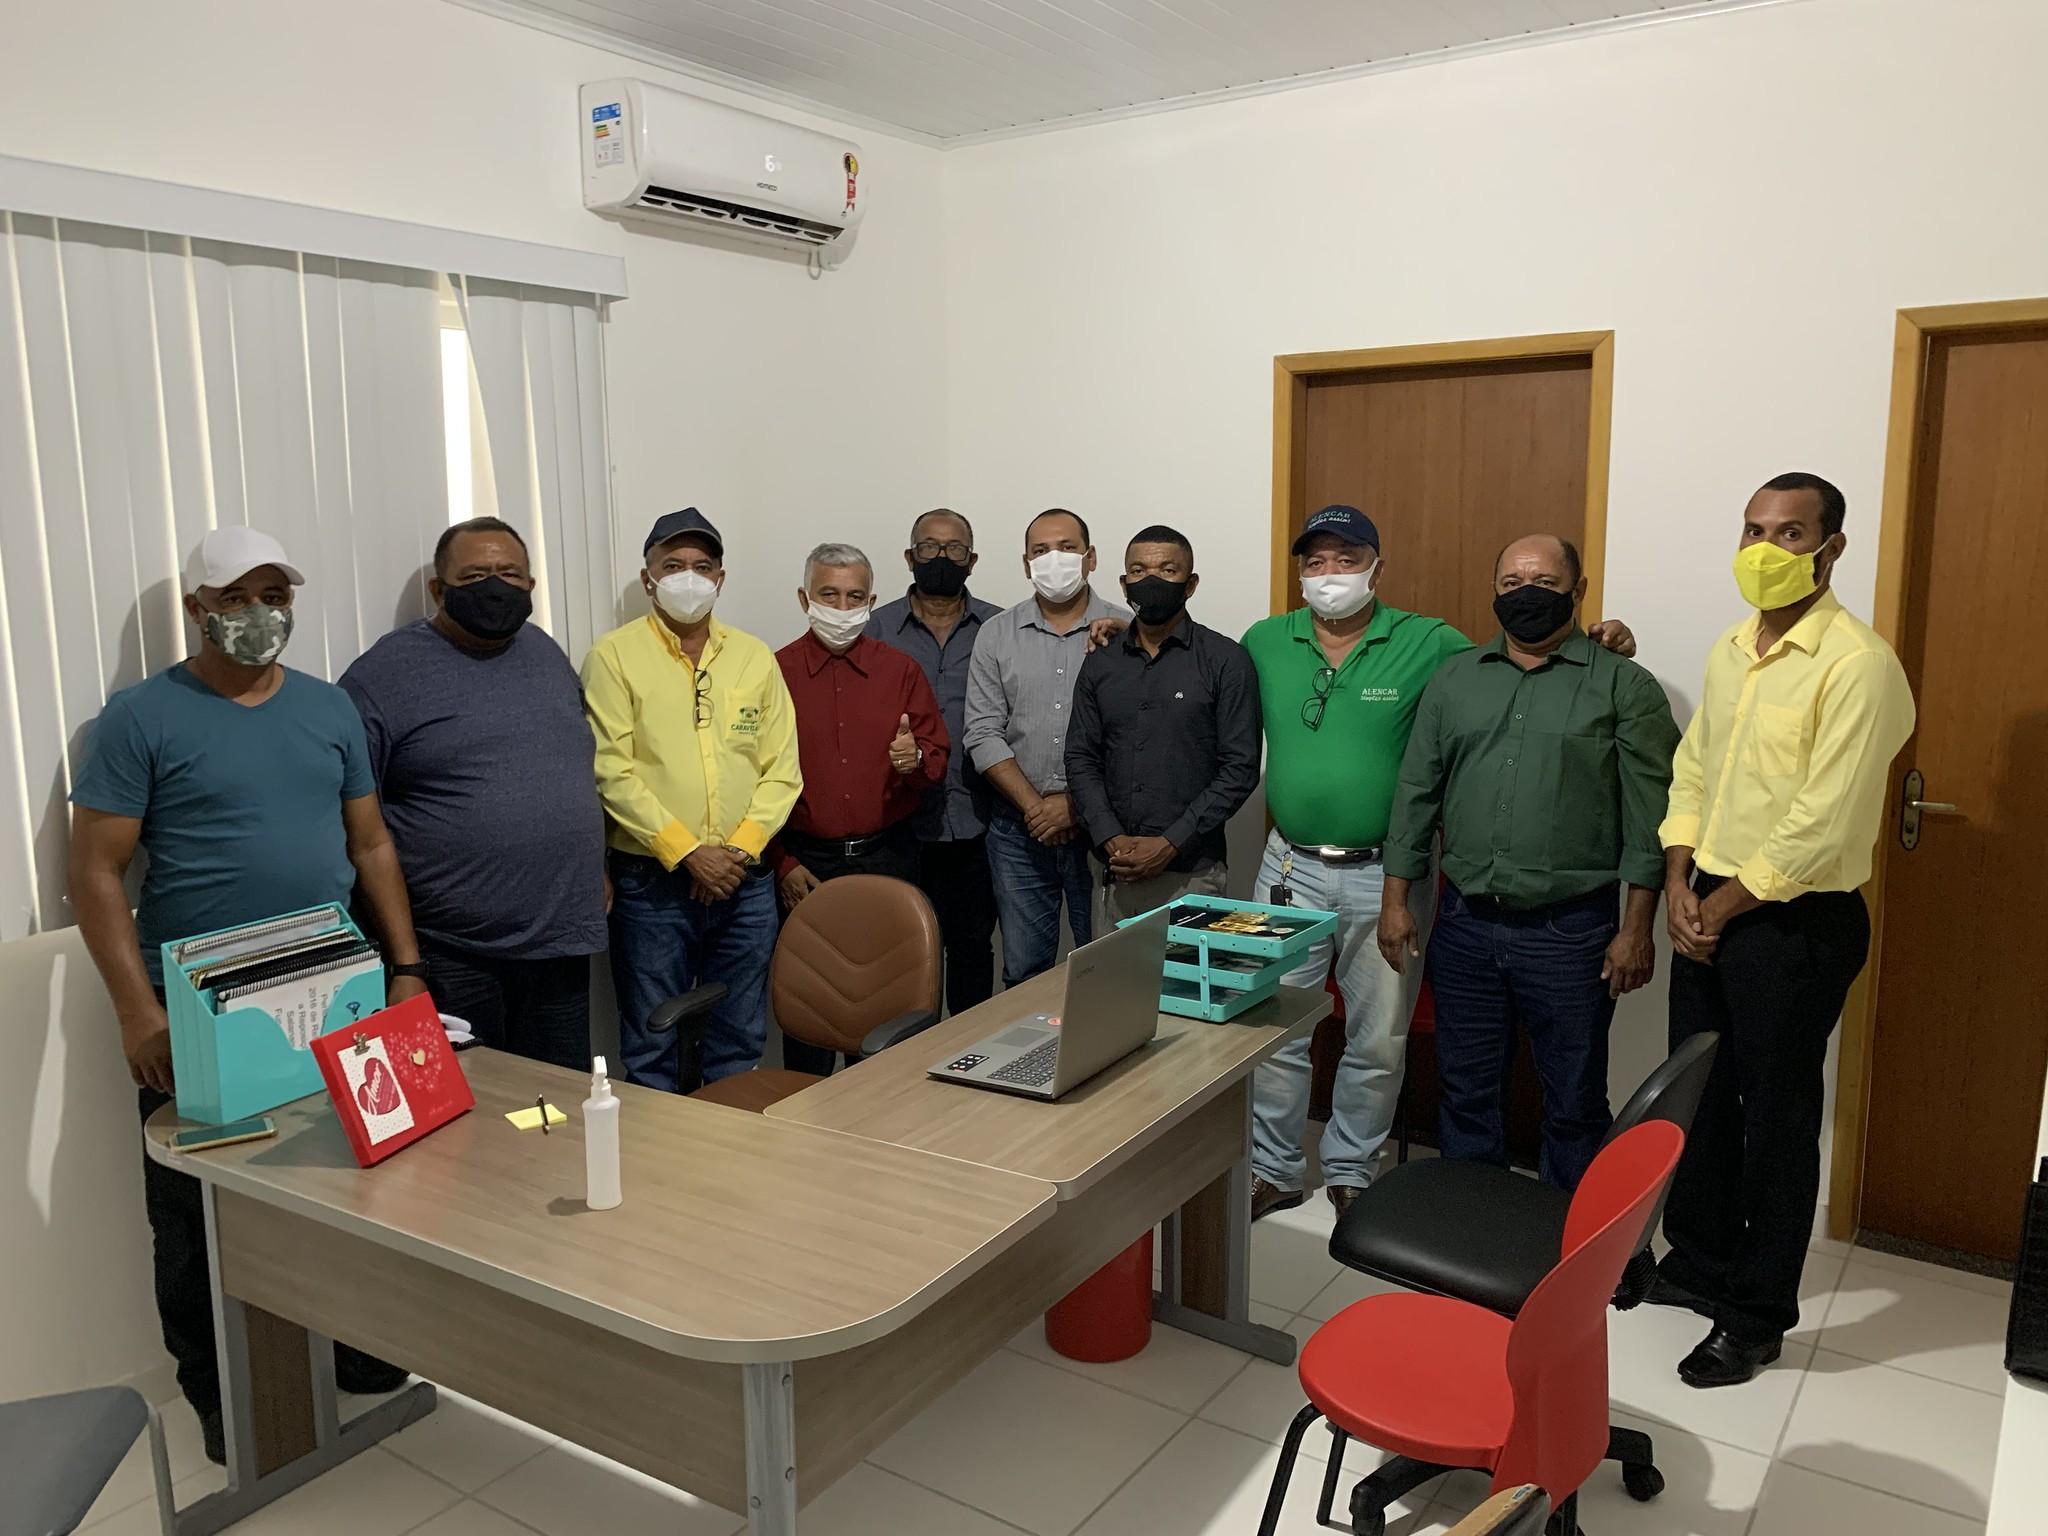 Silvio Ramalho (Prefeito de Caravelas) e nove dos onze vereadores do município (1)